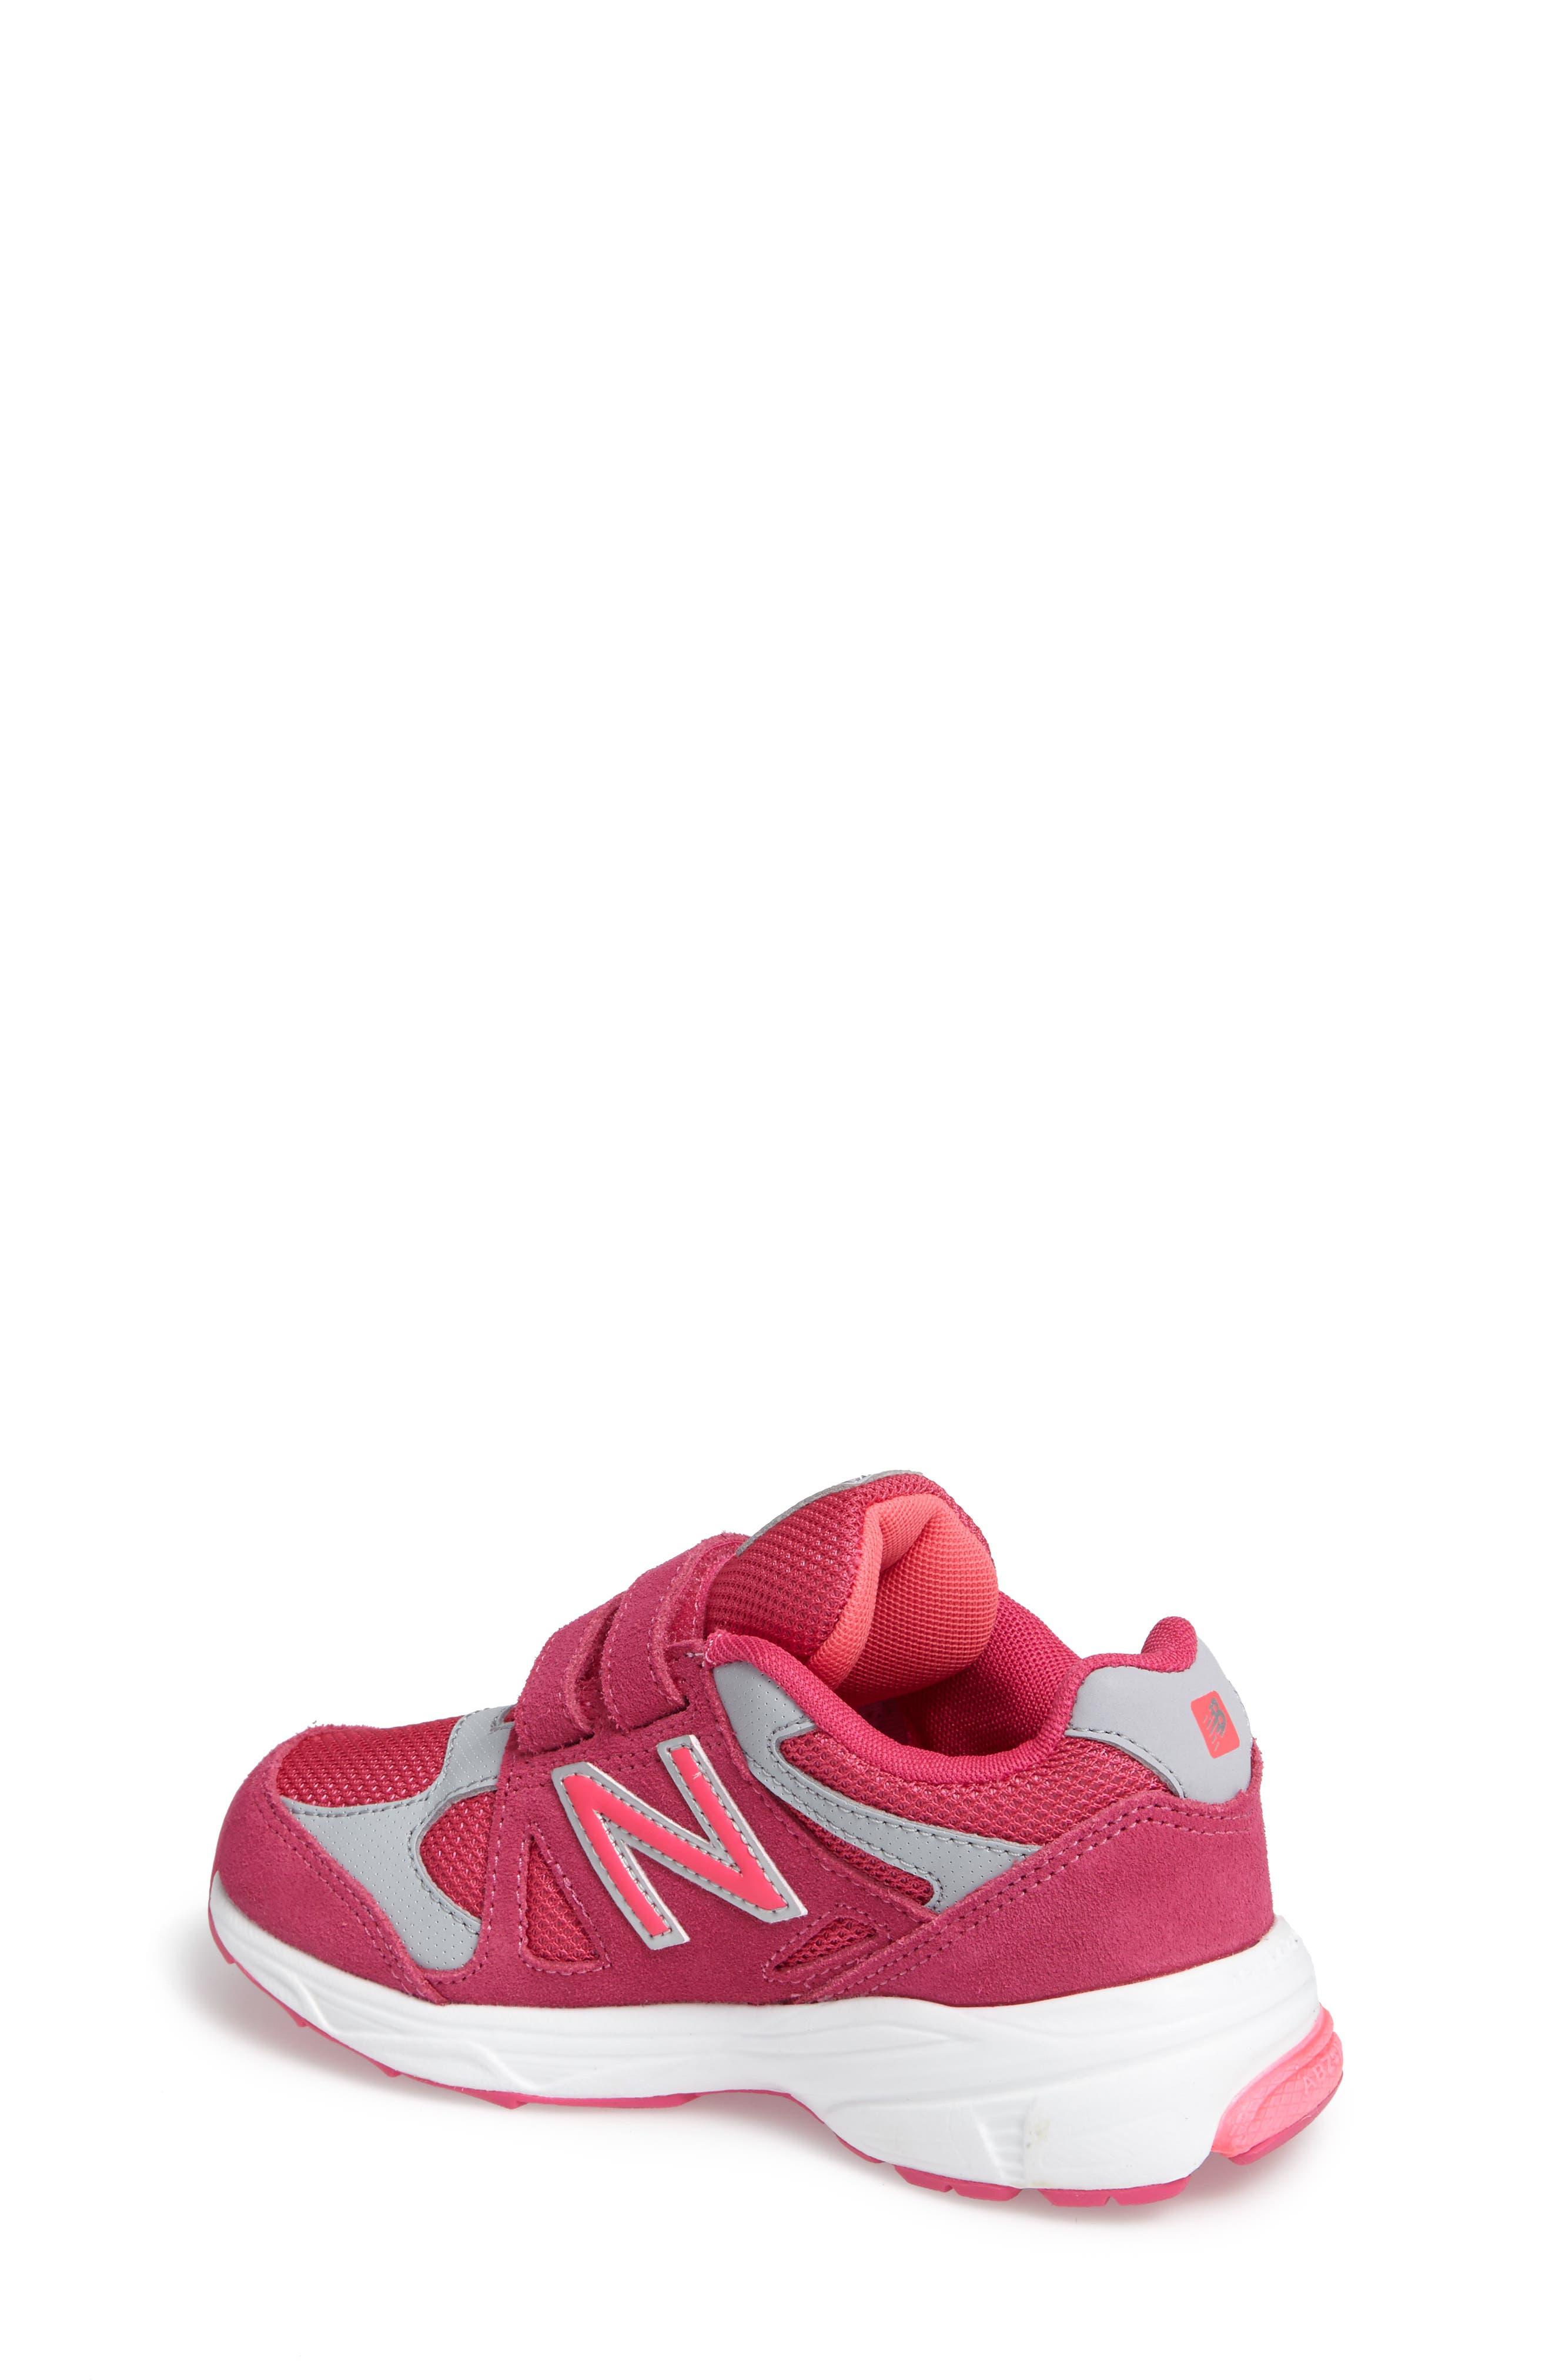 888 Sneaker,                             Alternate thumbnail 2, color,                             Pink/Grey